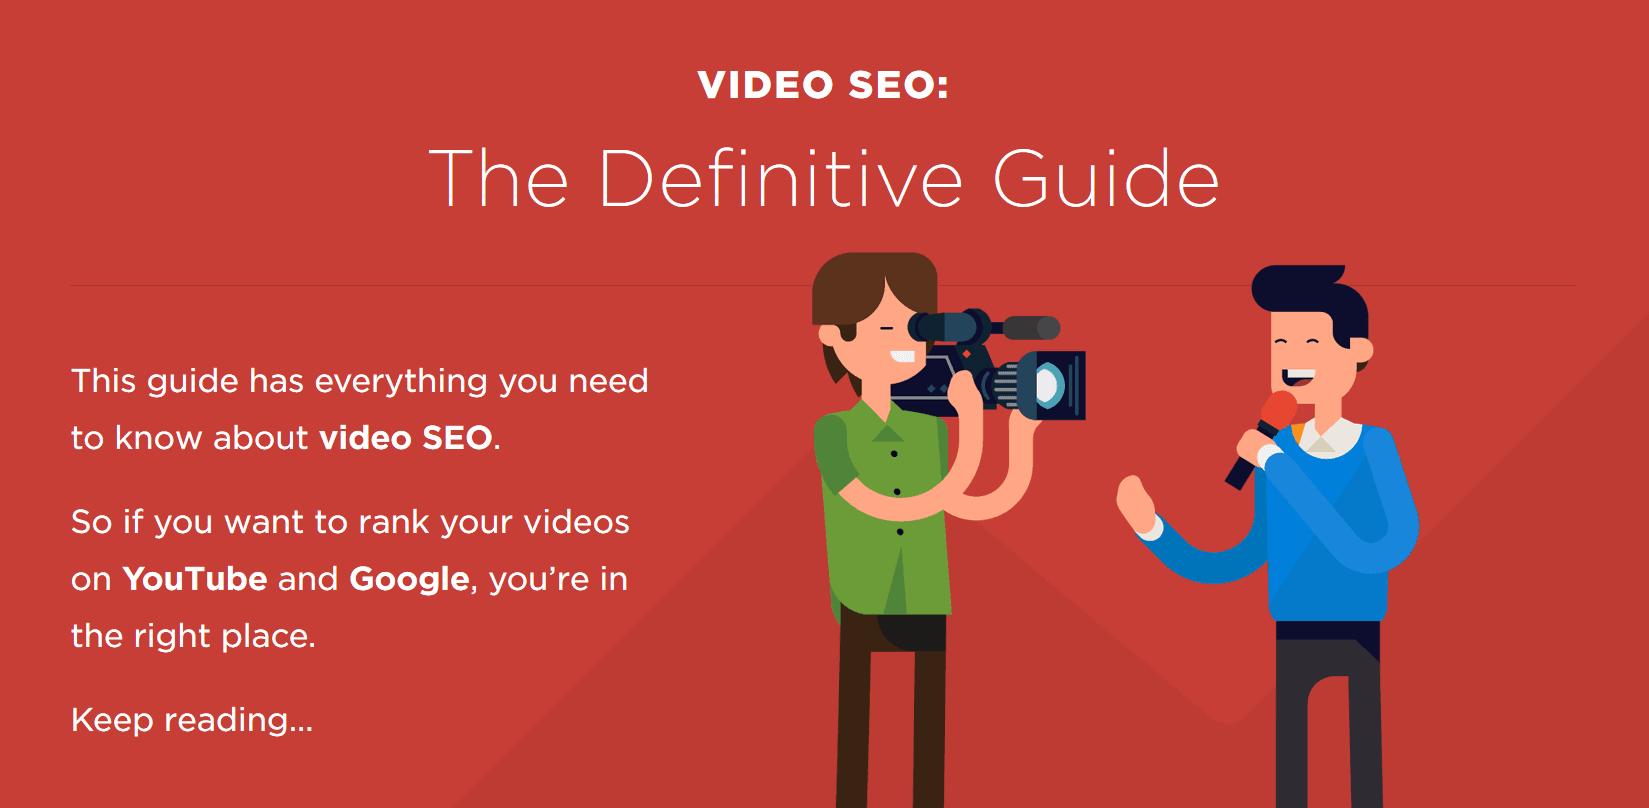 video seo guide